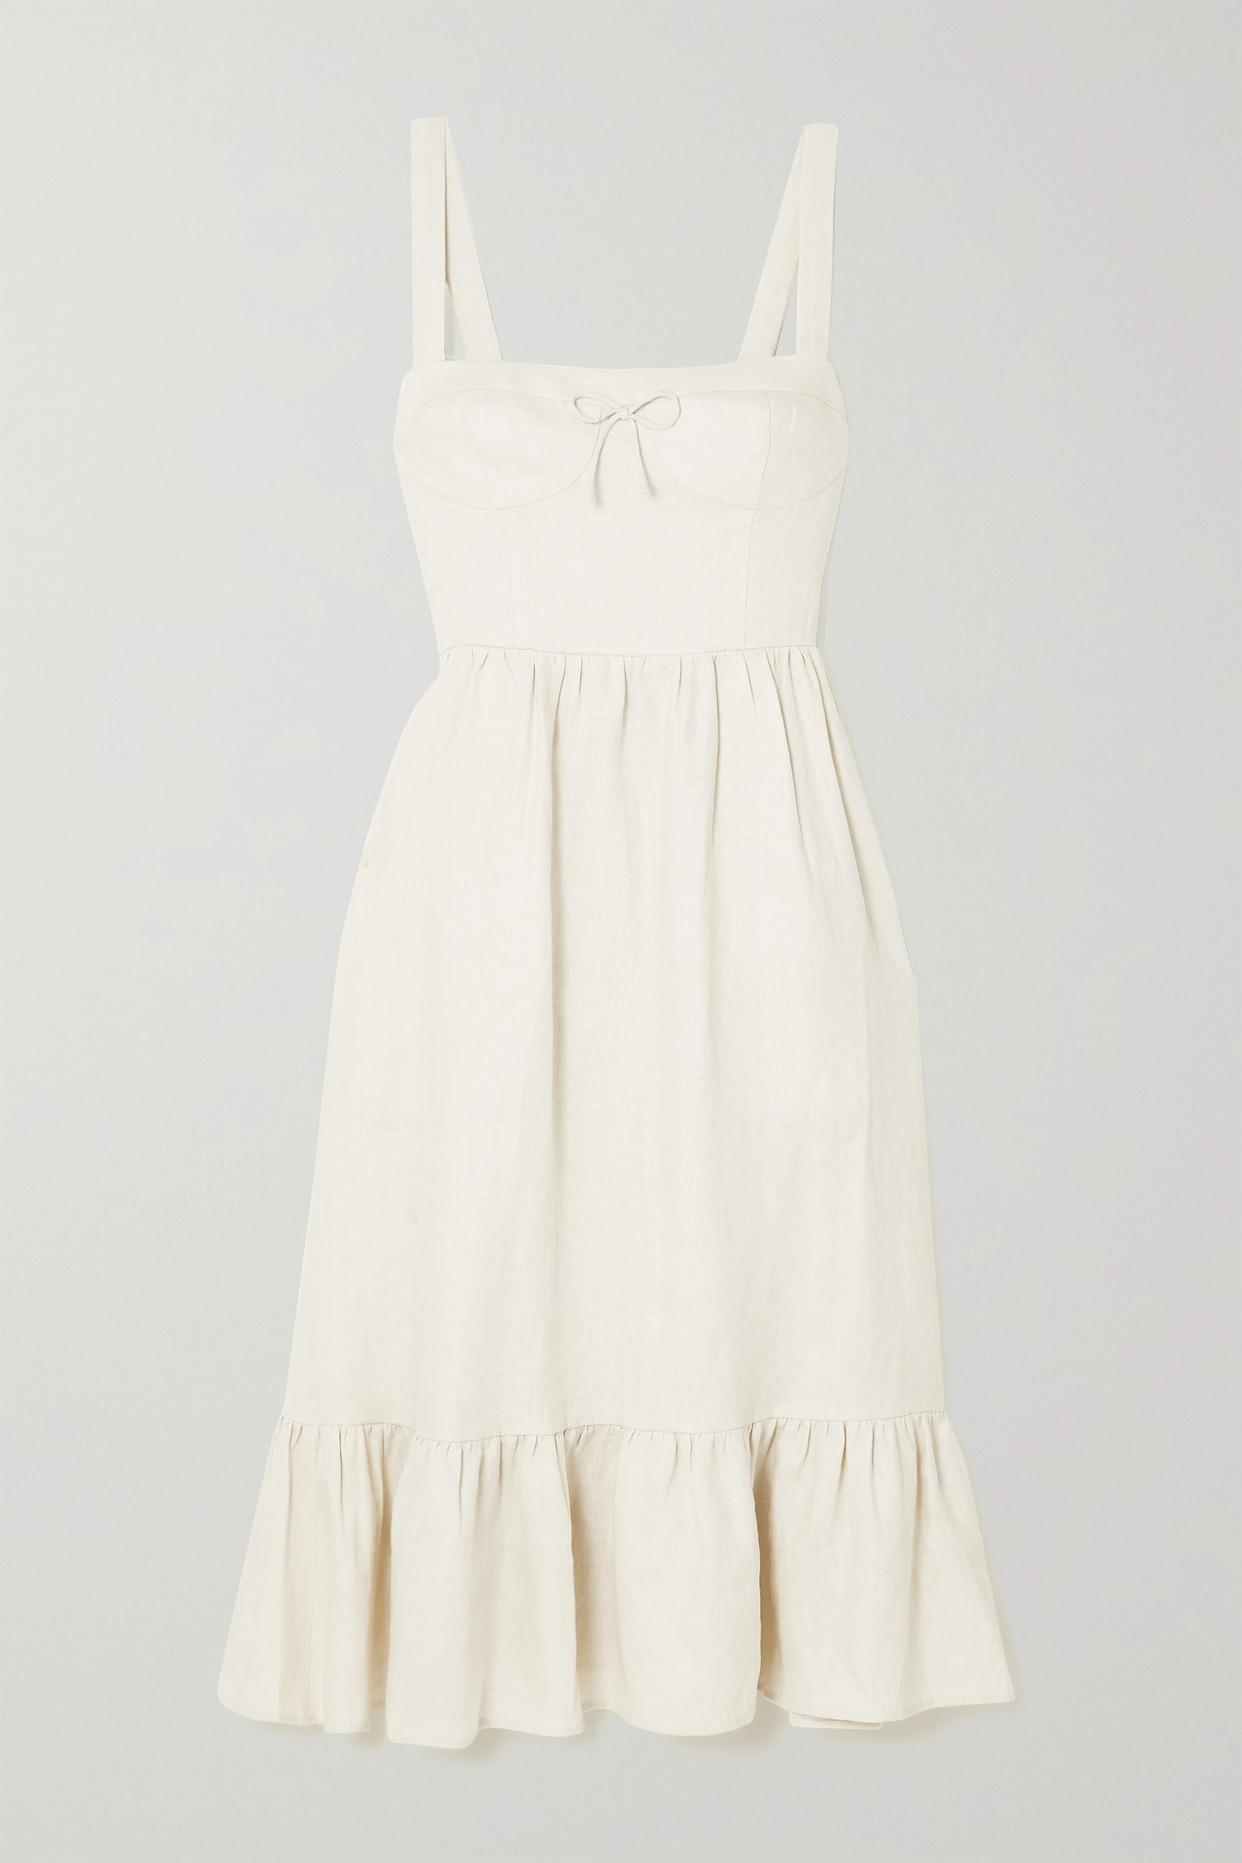 REFORMATION - Maegan Shirred Linen Midi Dress - Cream - US10